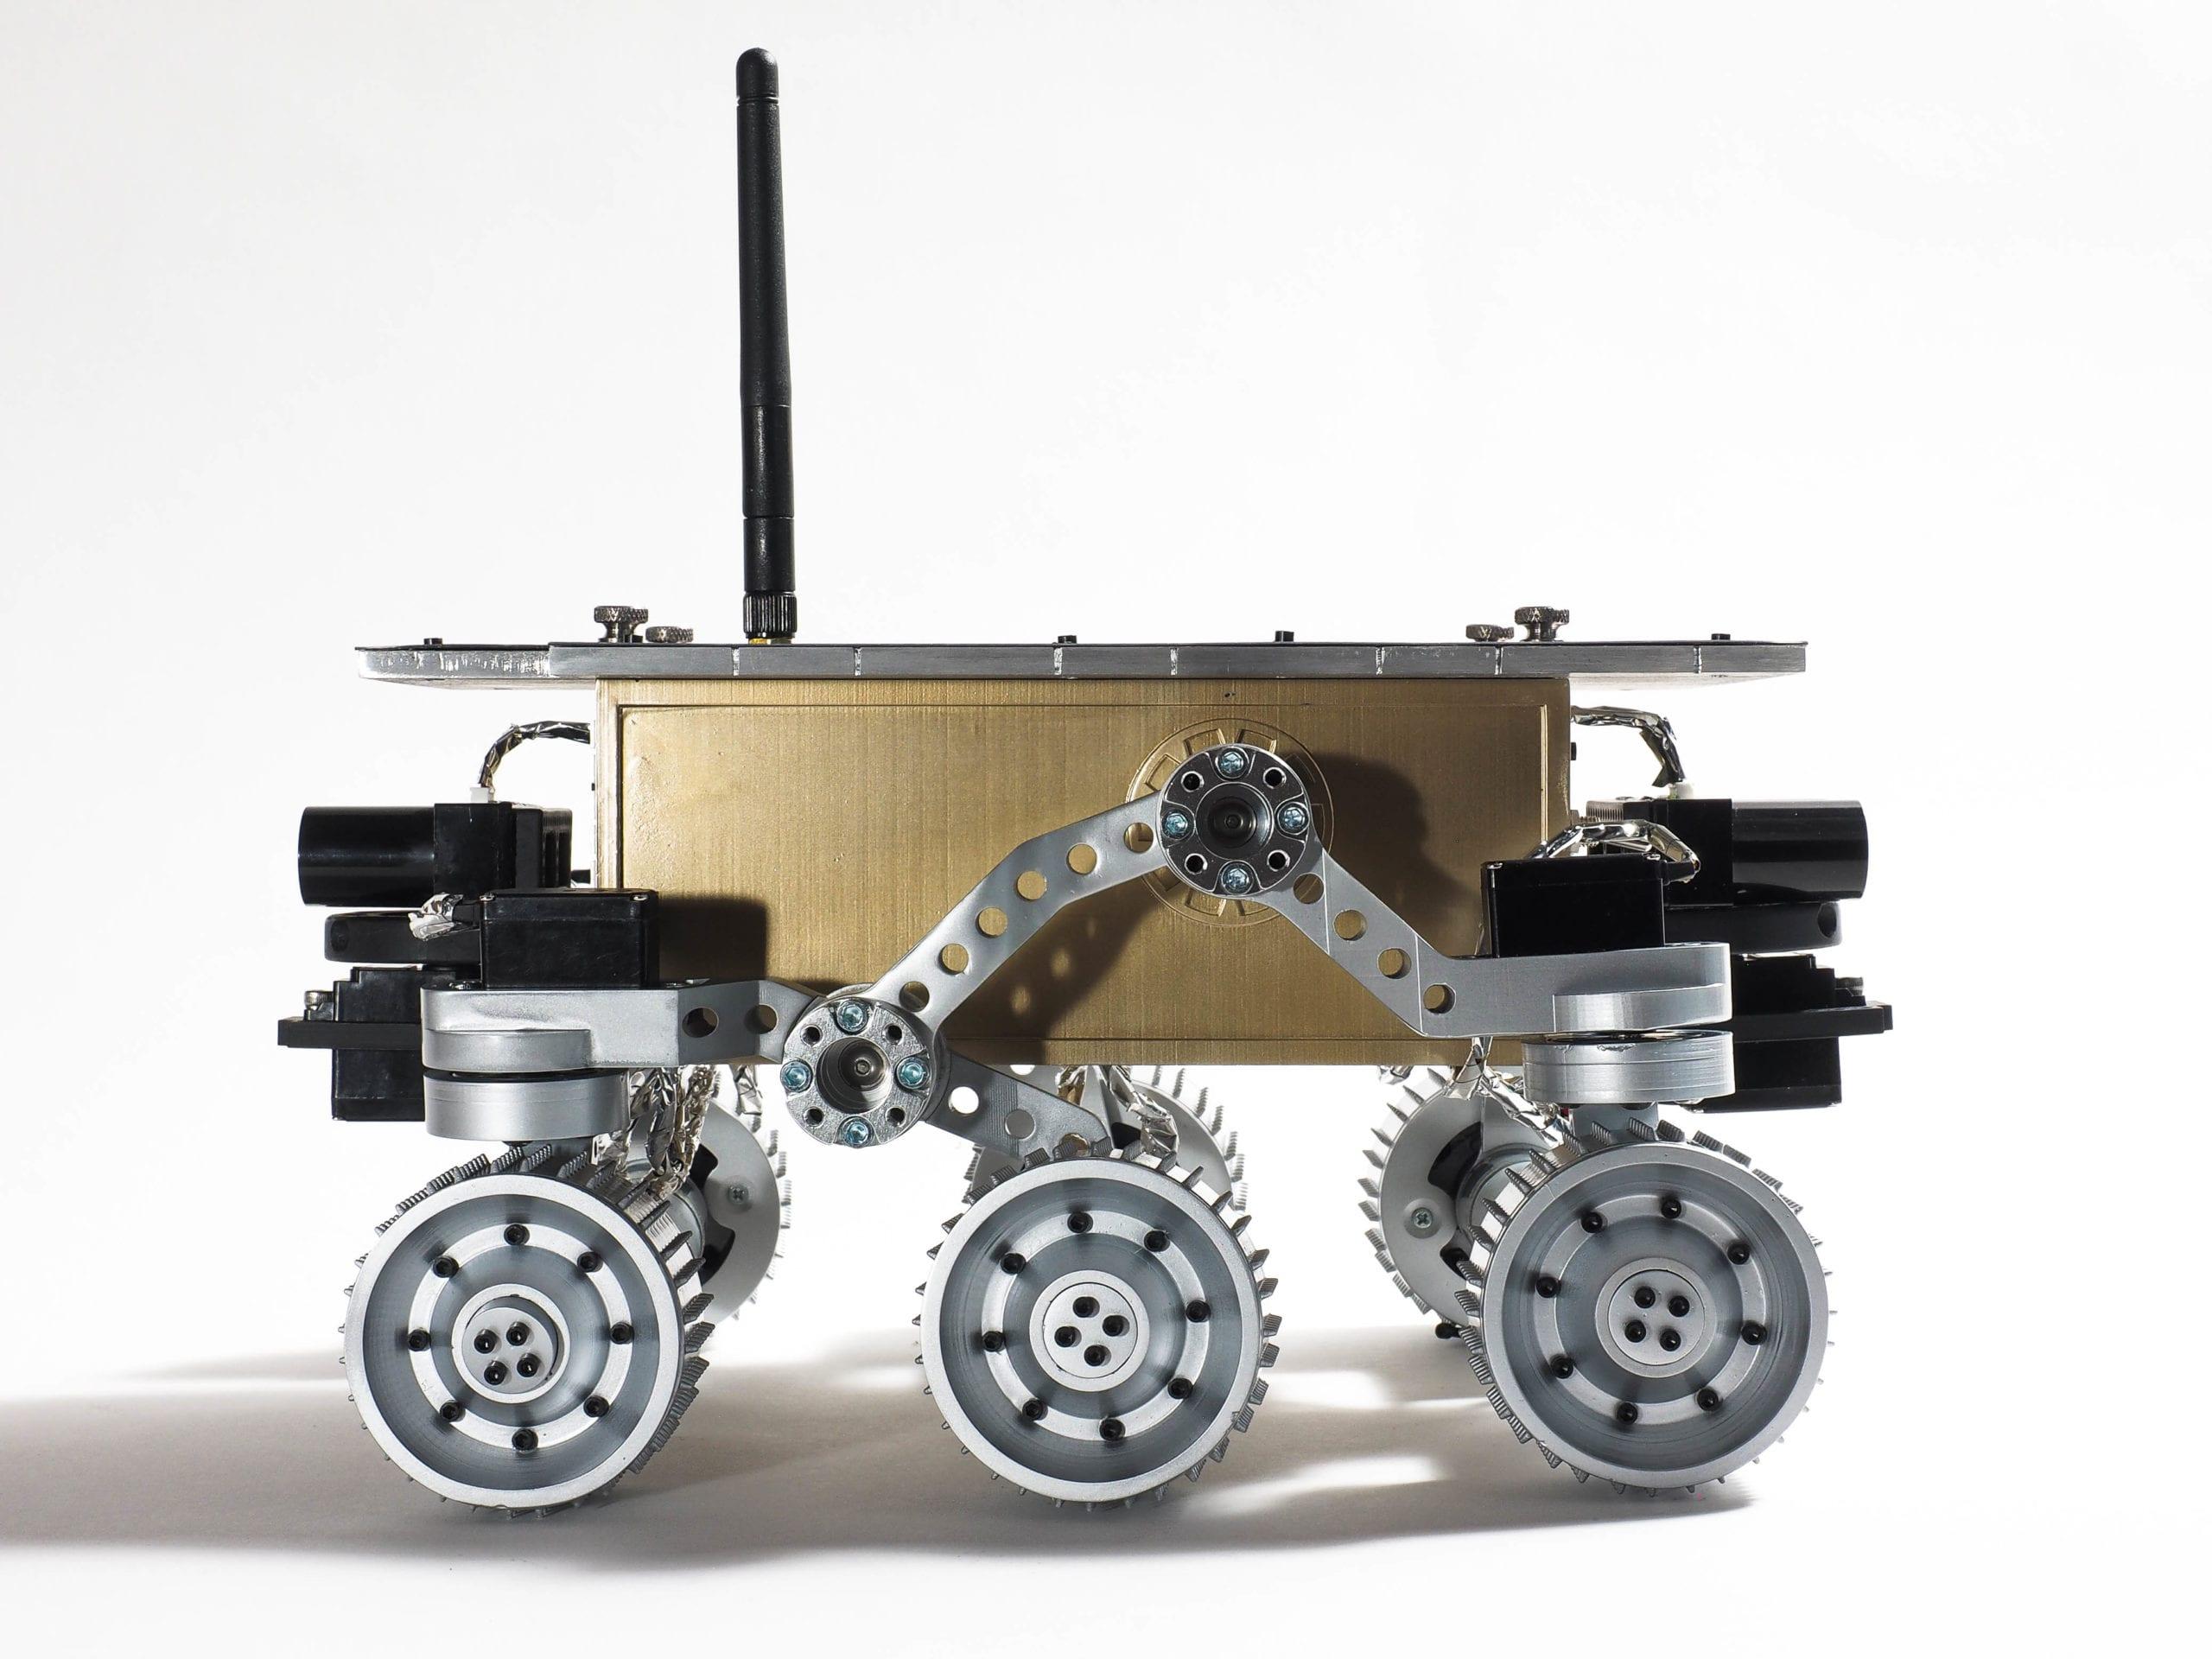 Sojourner Mars Rover